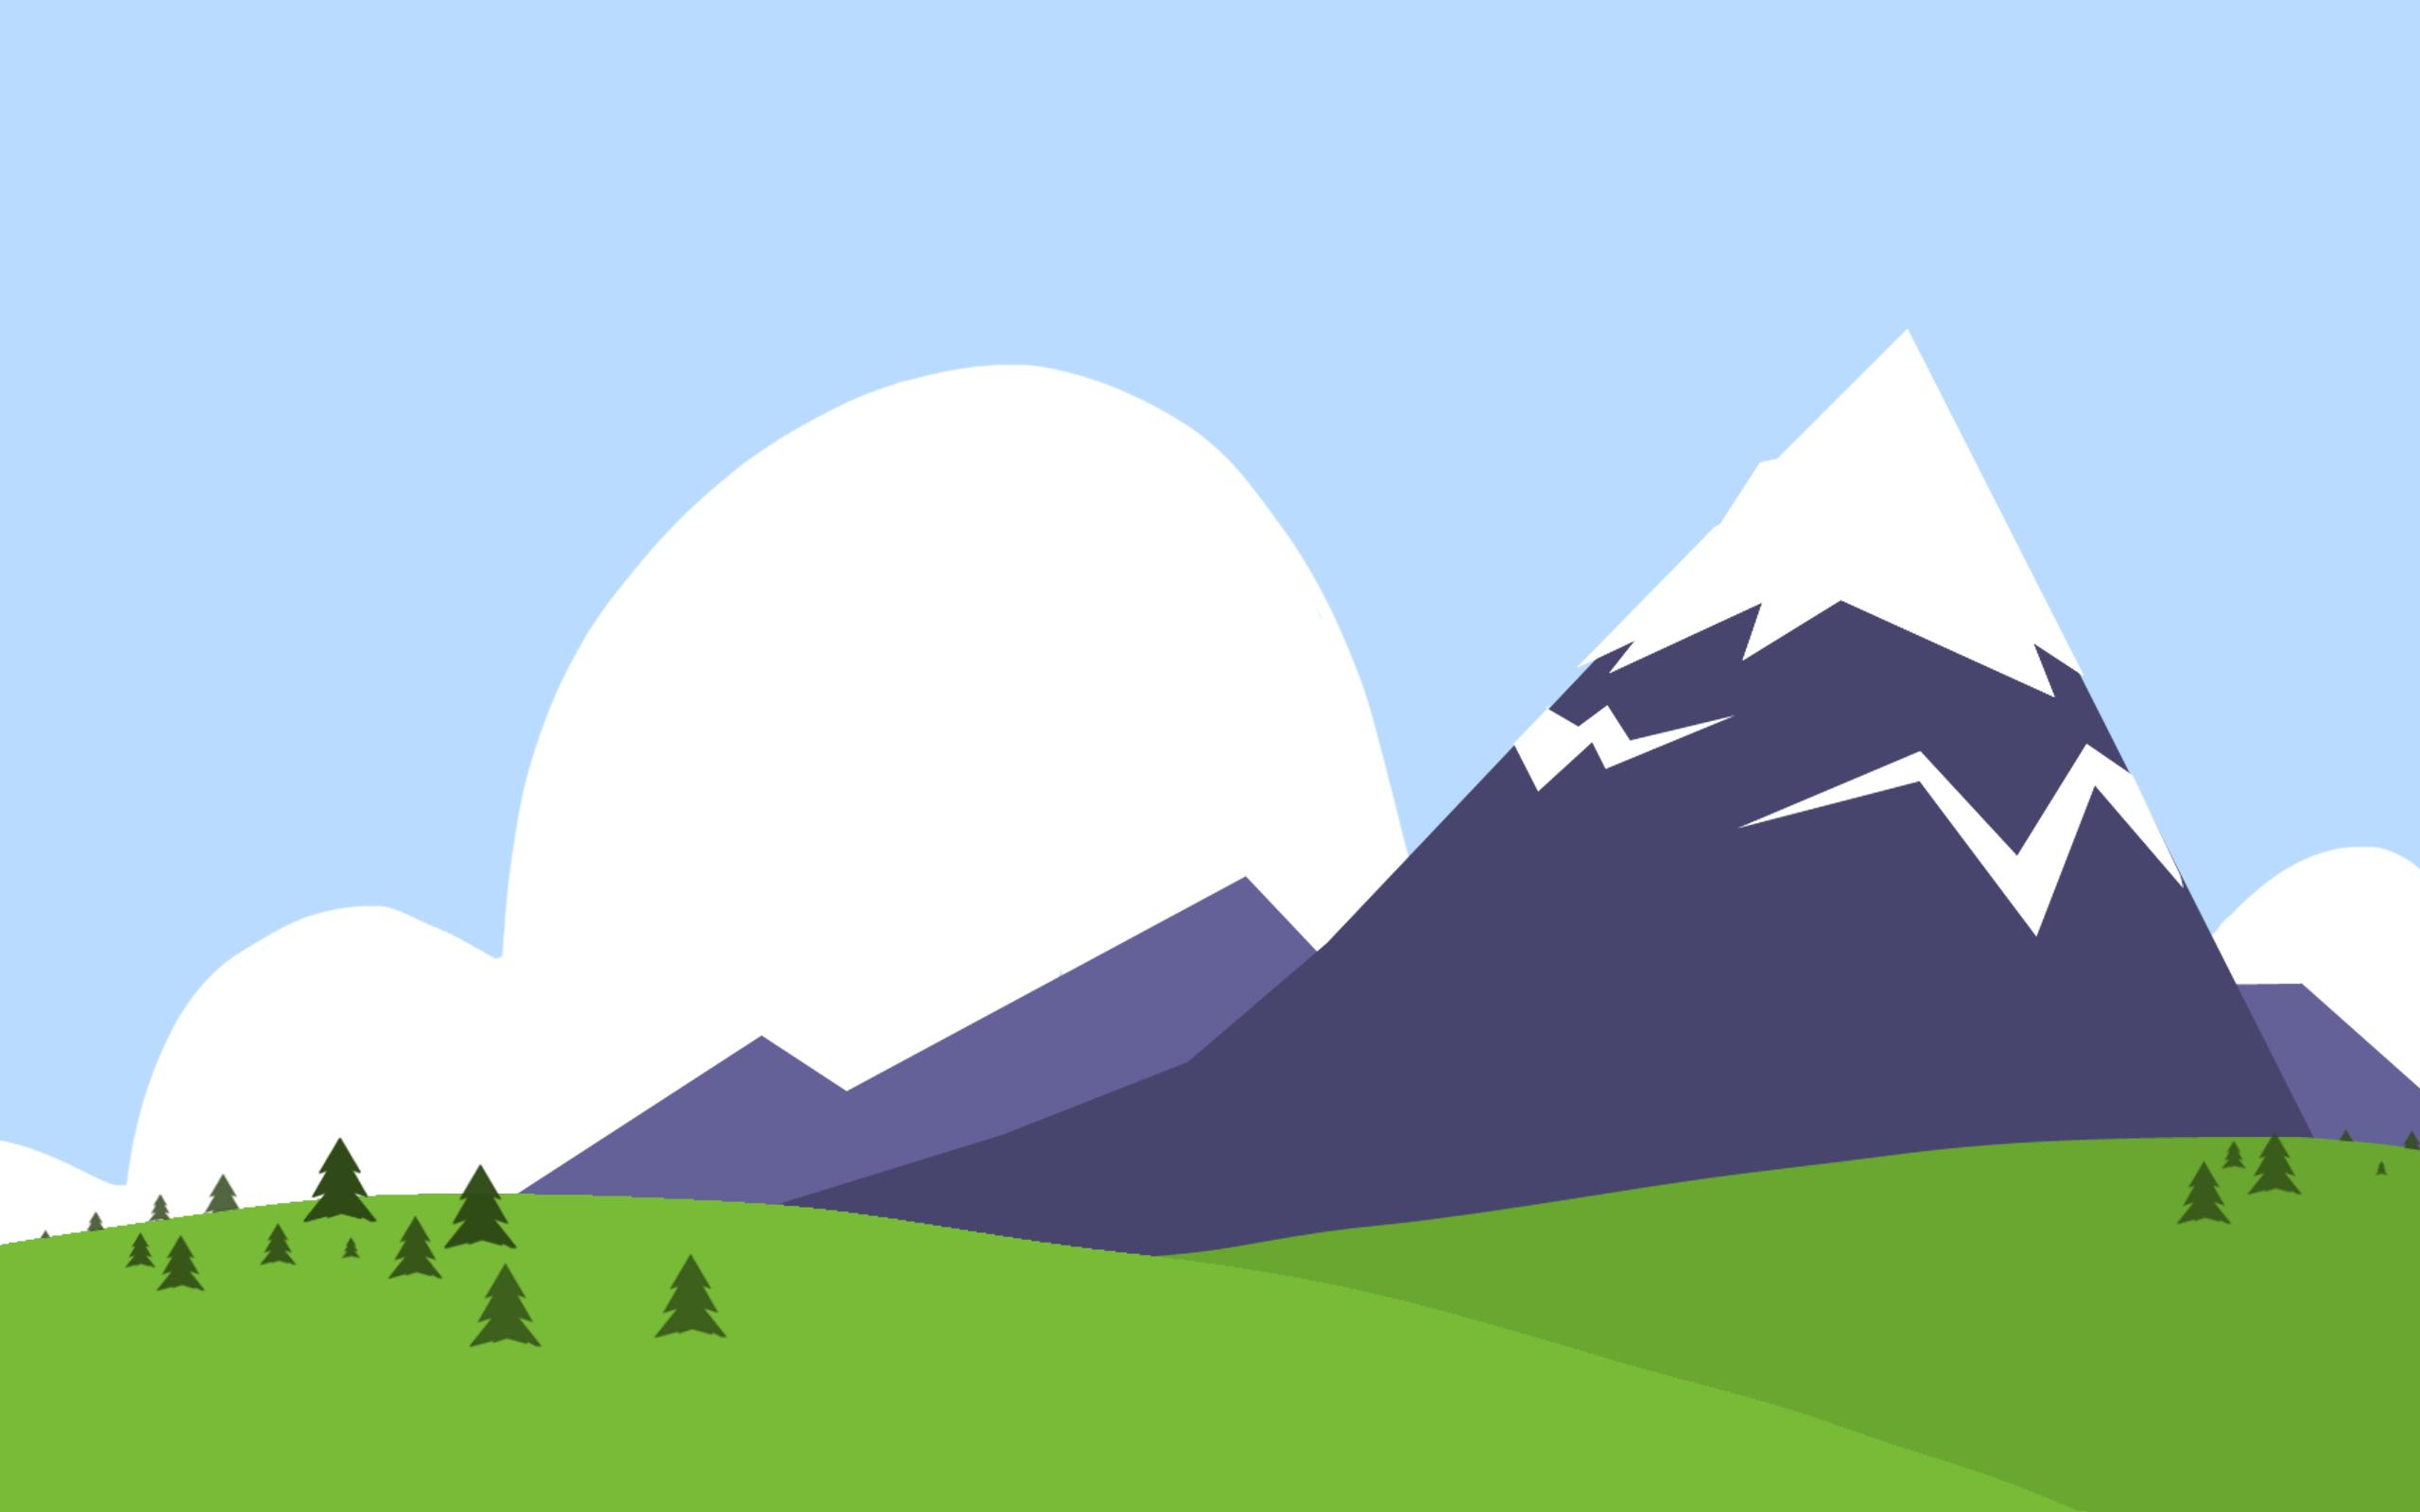 Background clipart mountain Illustrations ClipartFest clipart  clipart